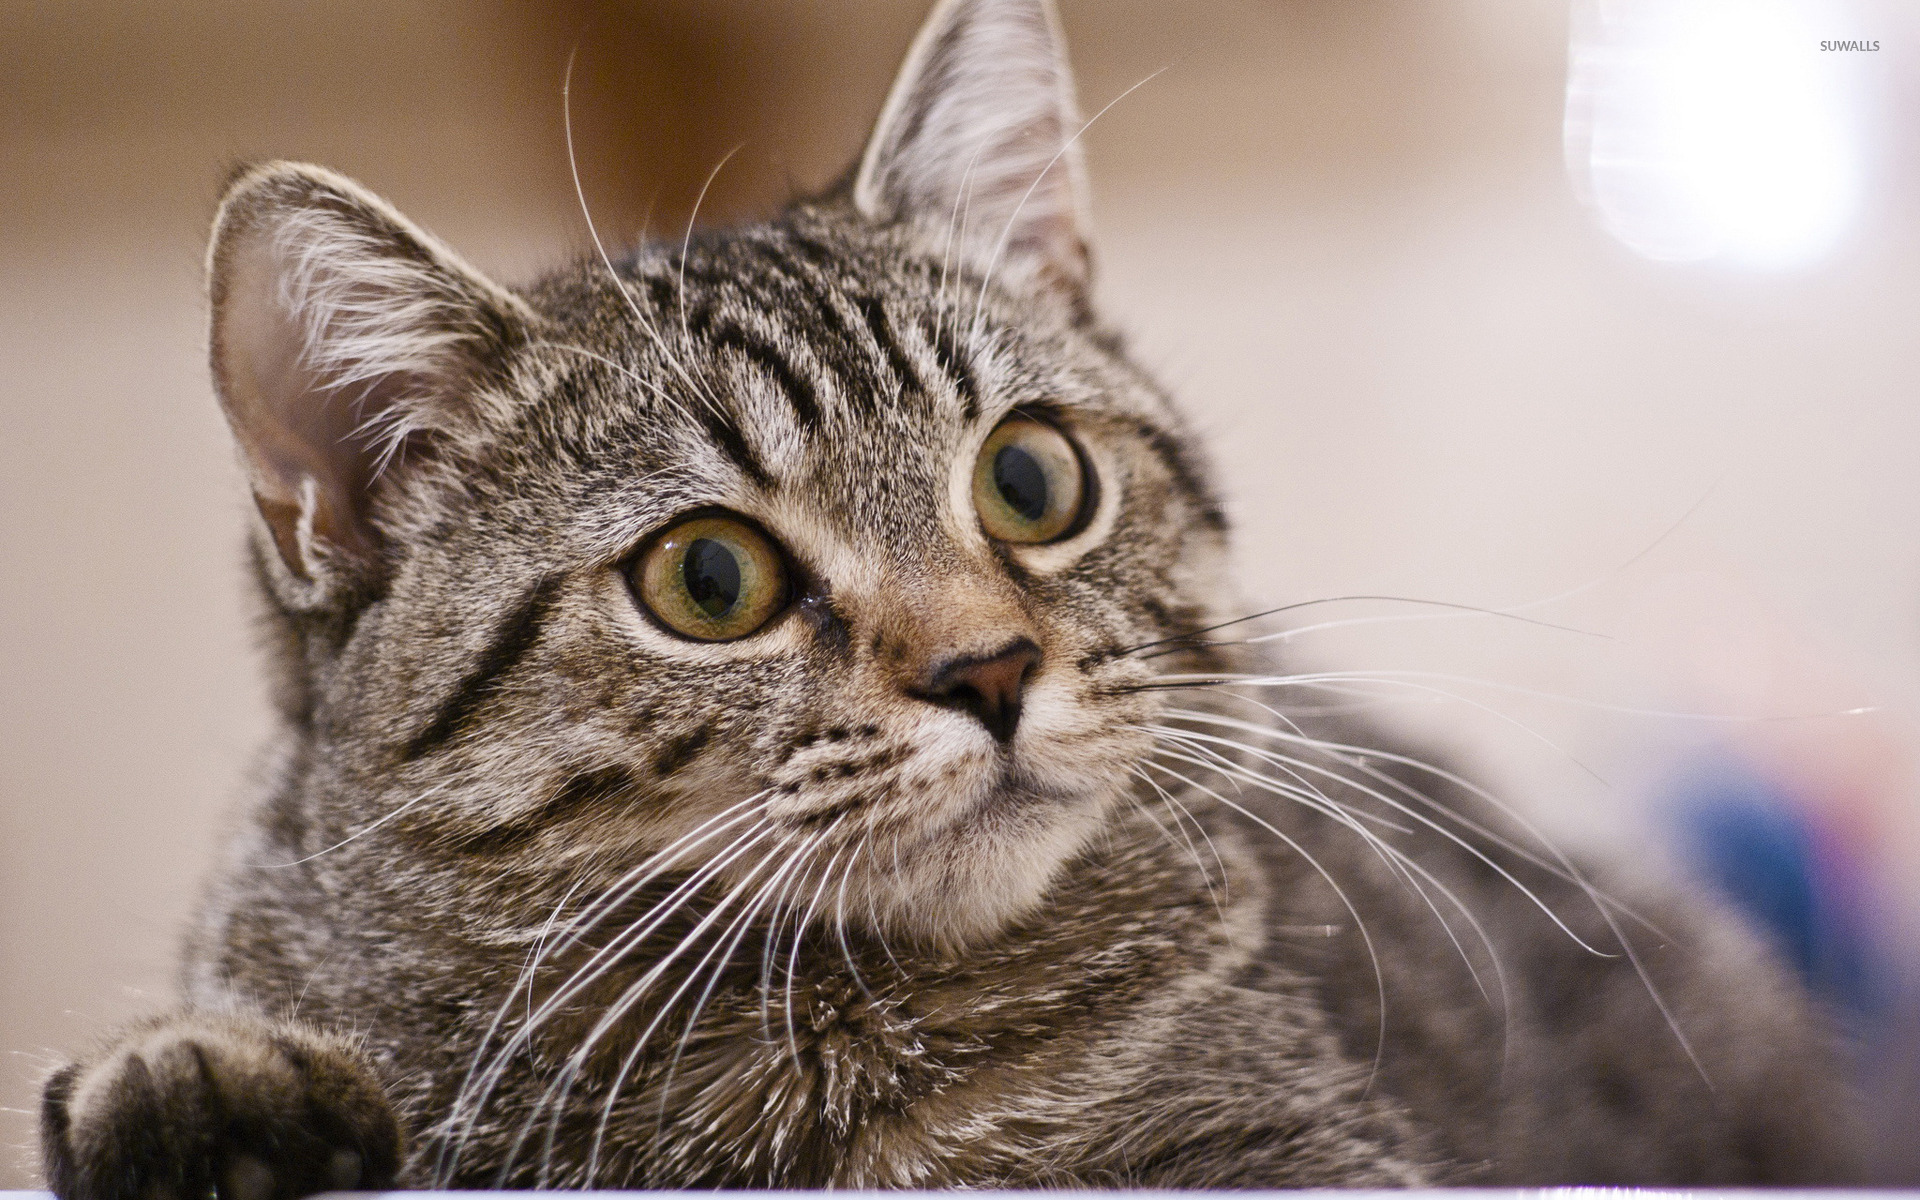 Wonderful Cat Wallpaper 1920x1200 - gray-cat-40237-1920x1200  Image_1002953 .jpg